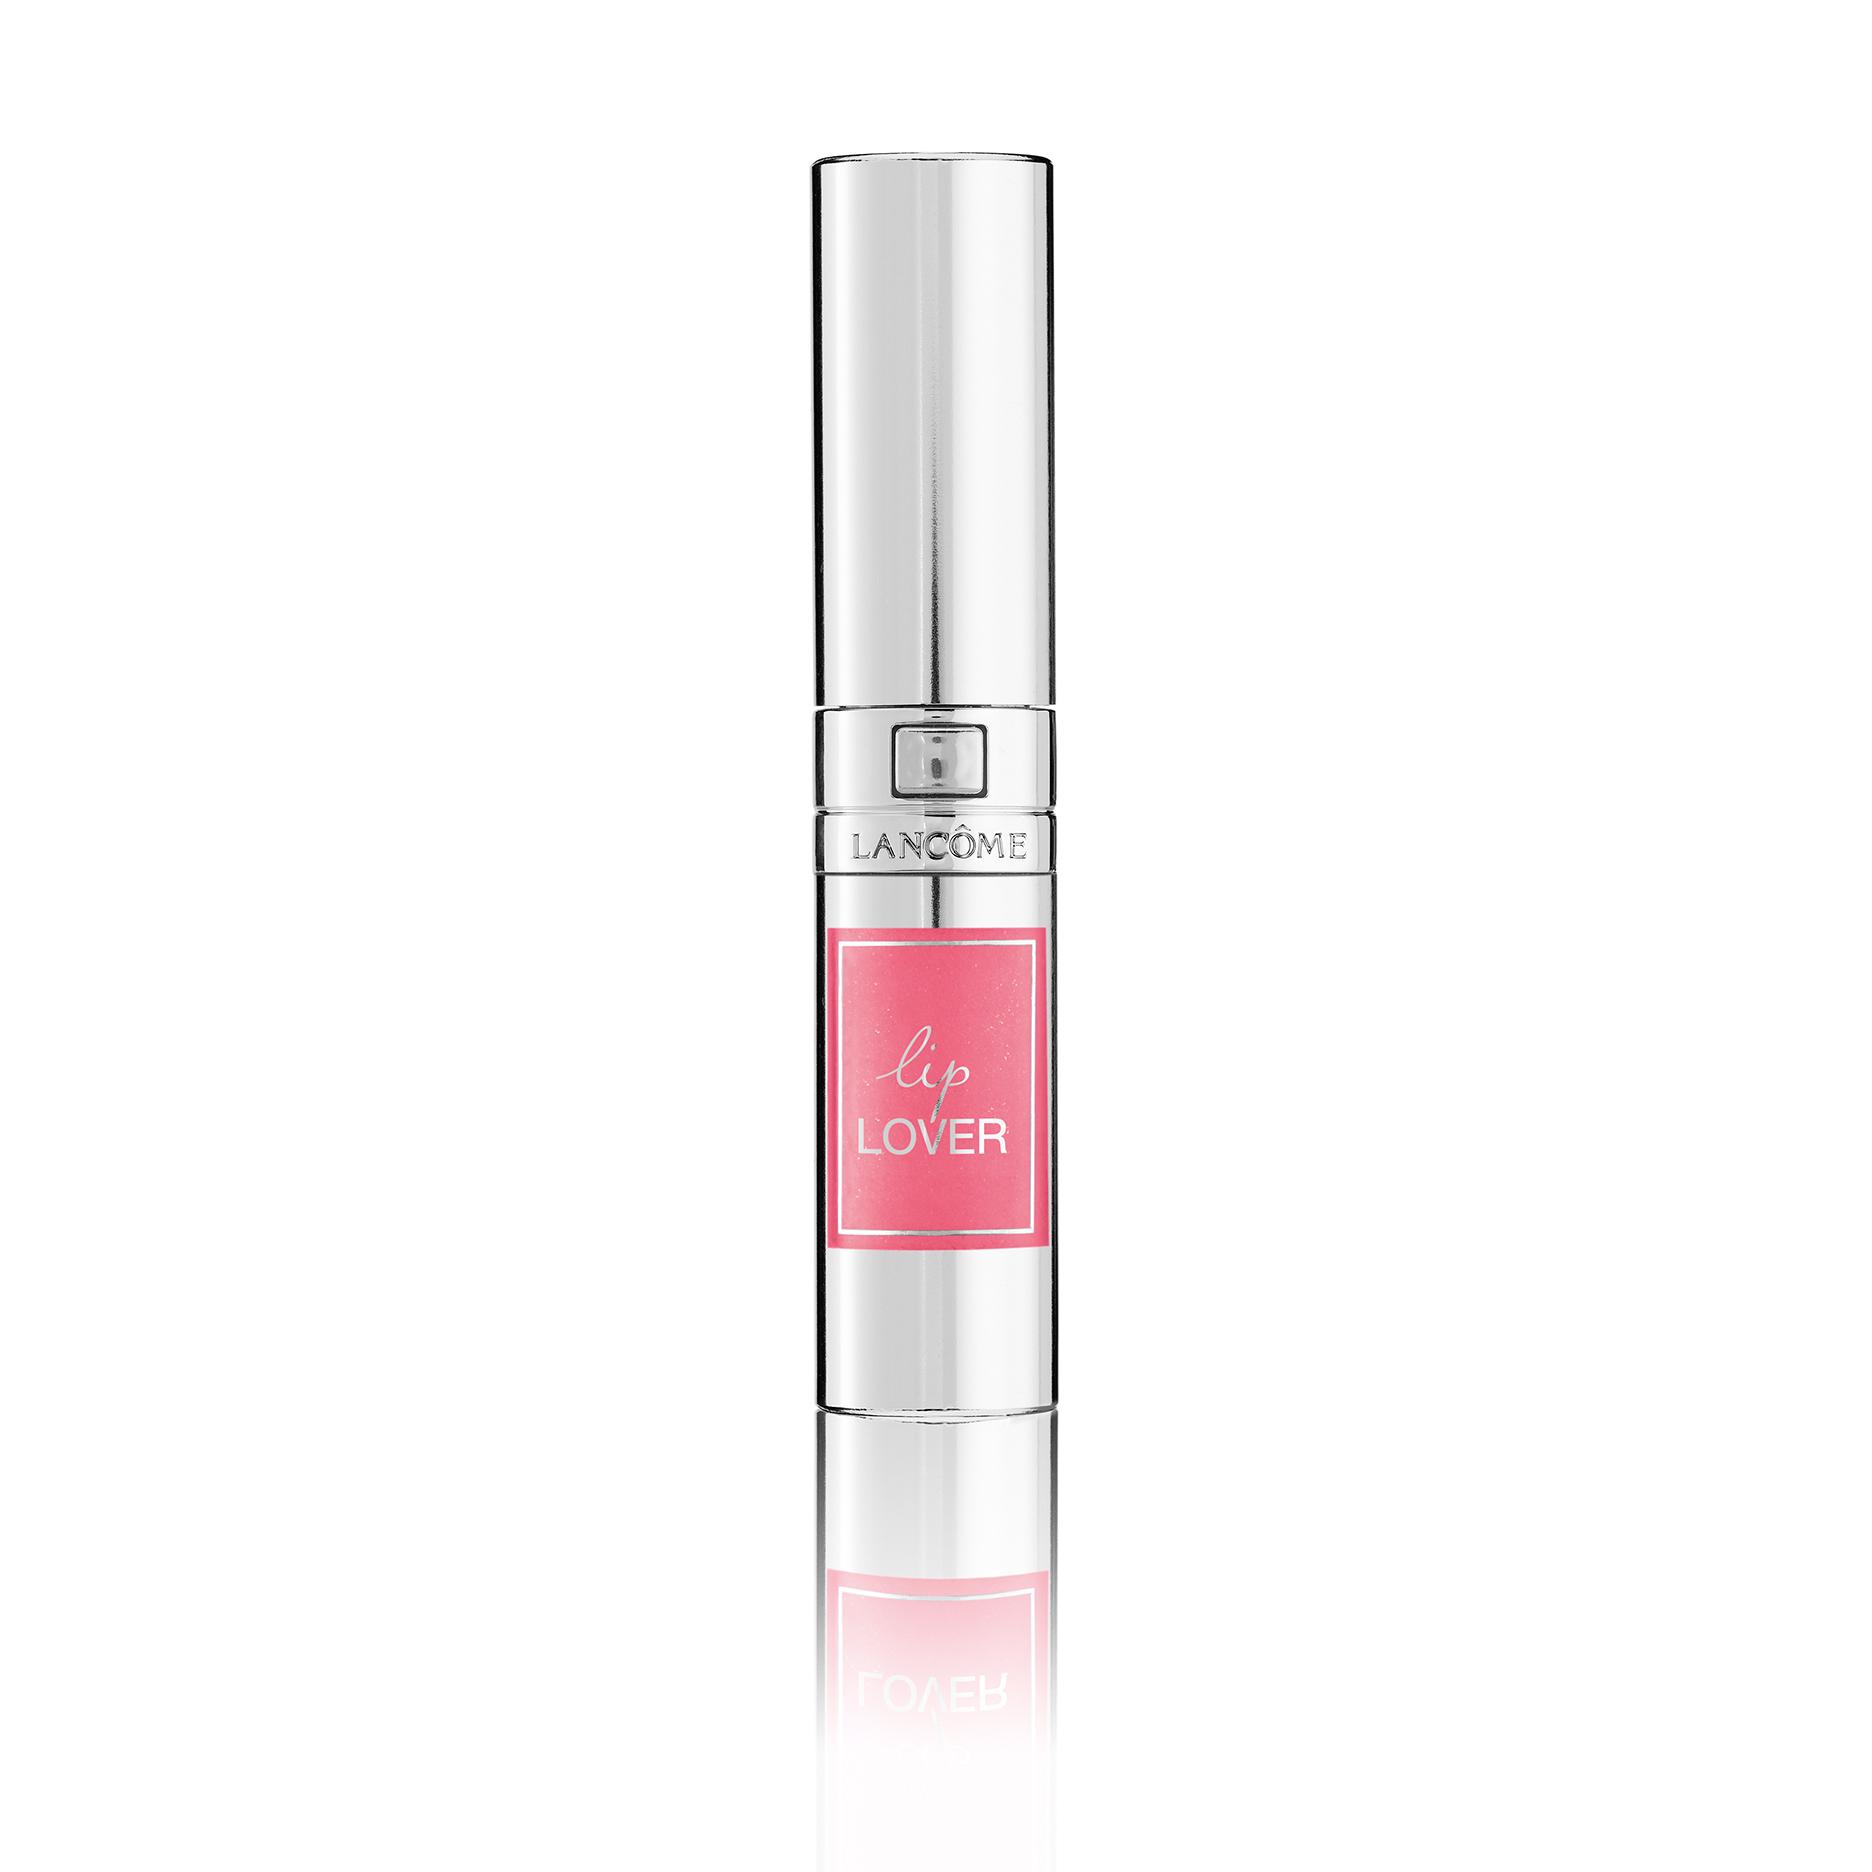 Lancome Lip Lover in 313 Rose Ballet